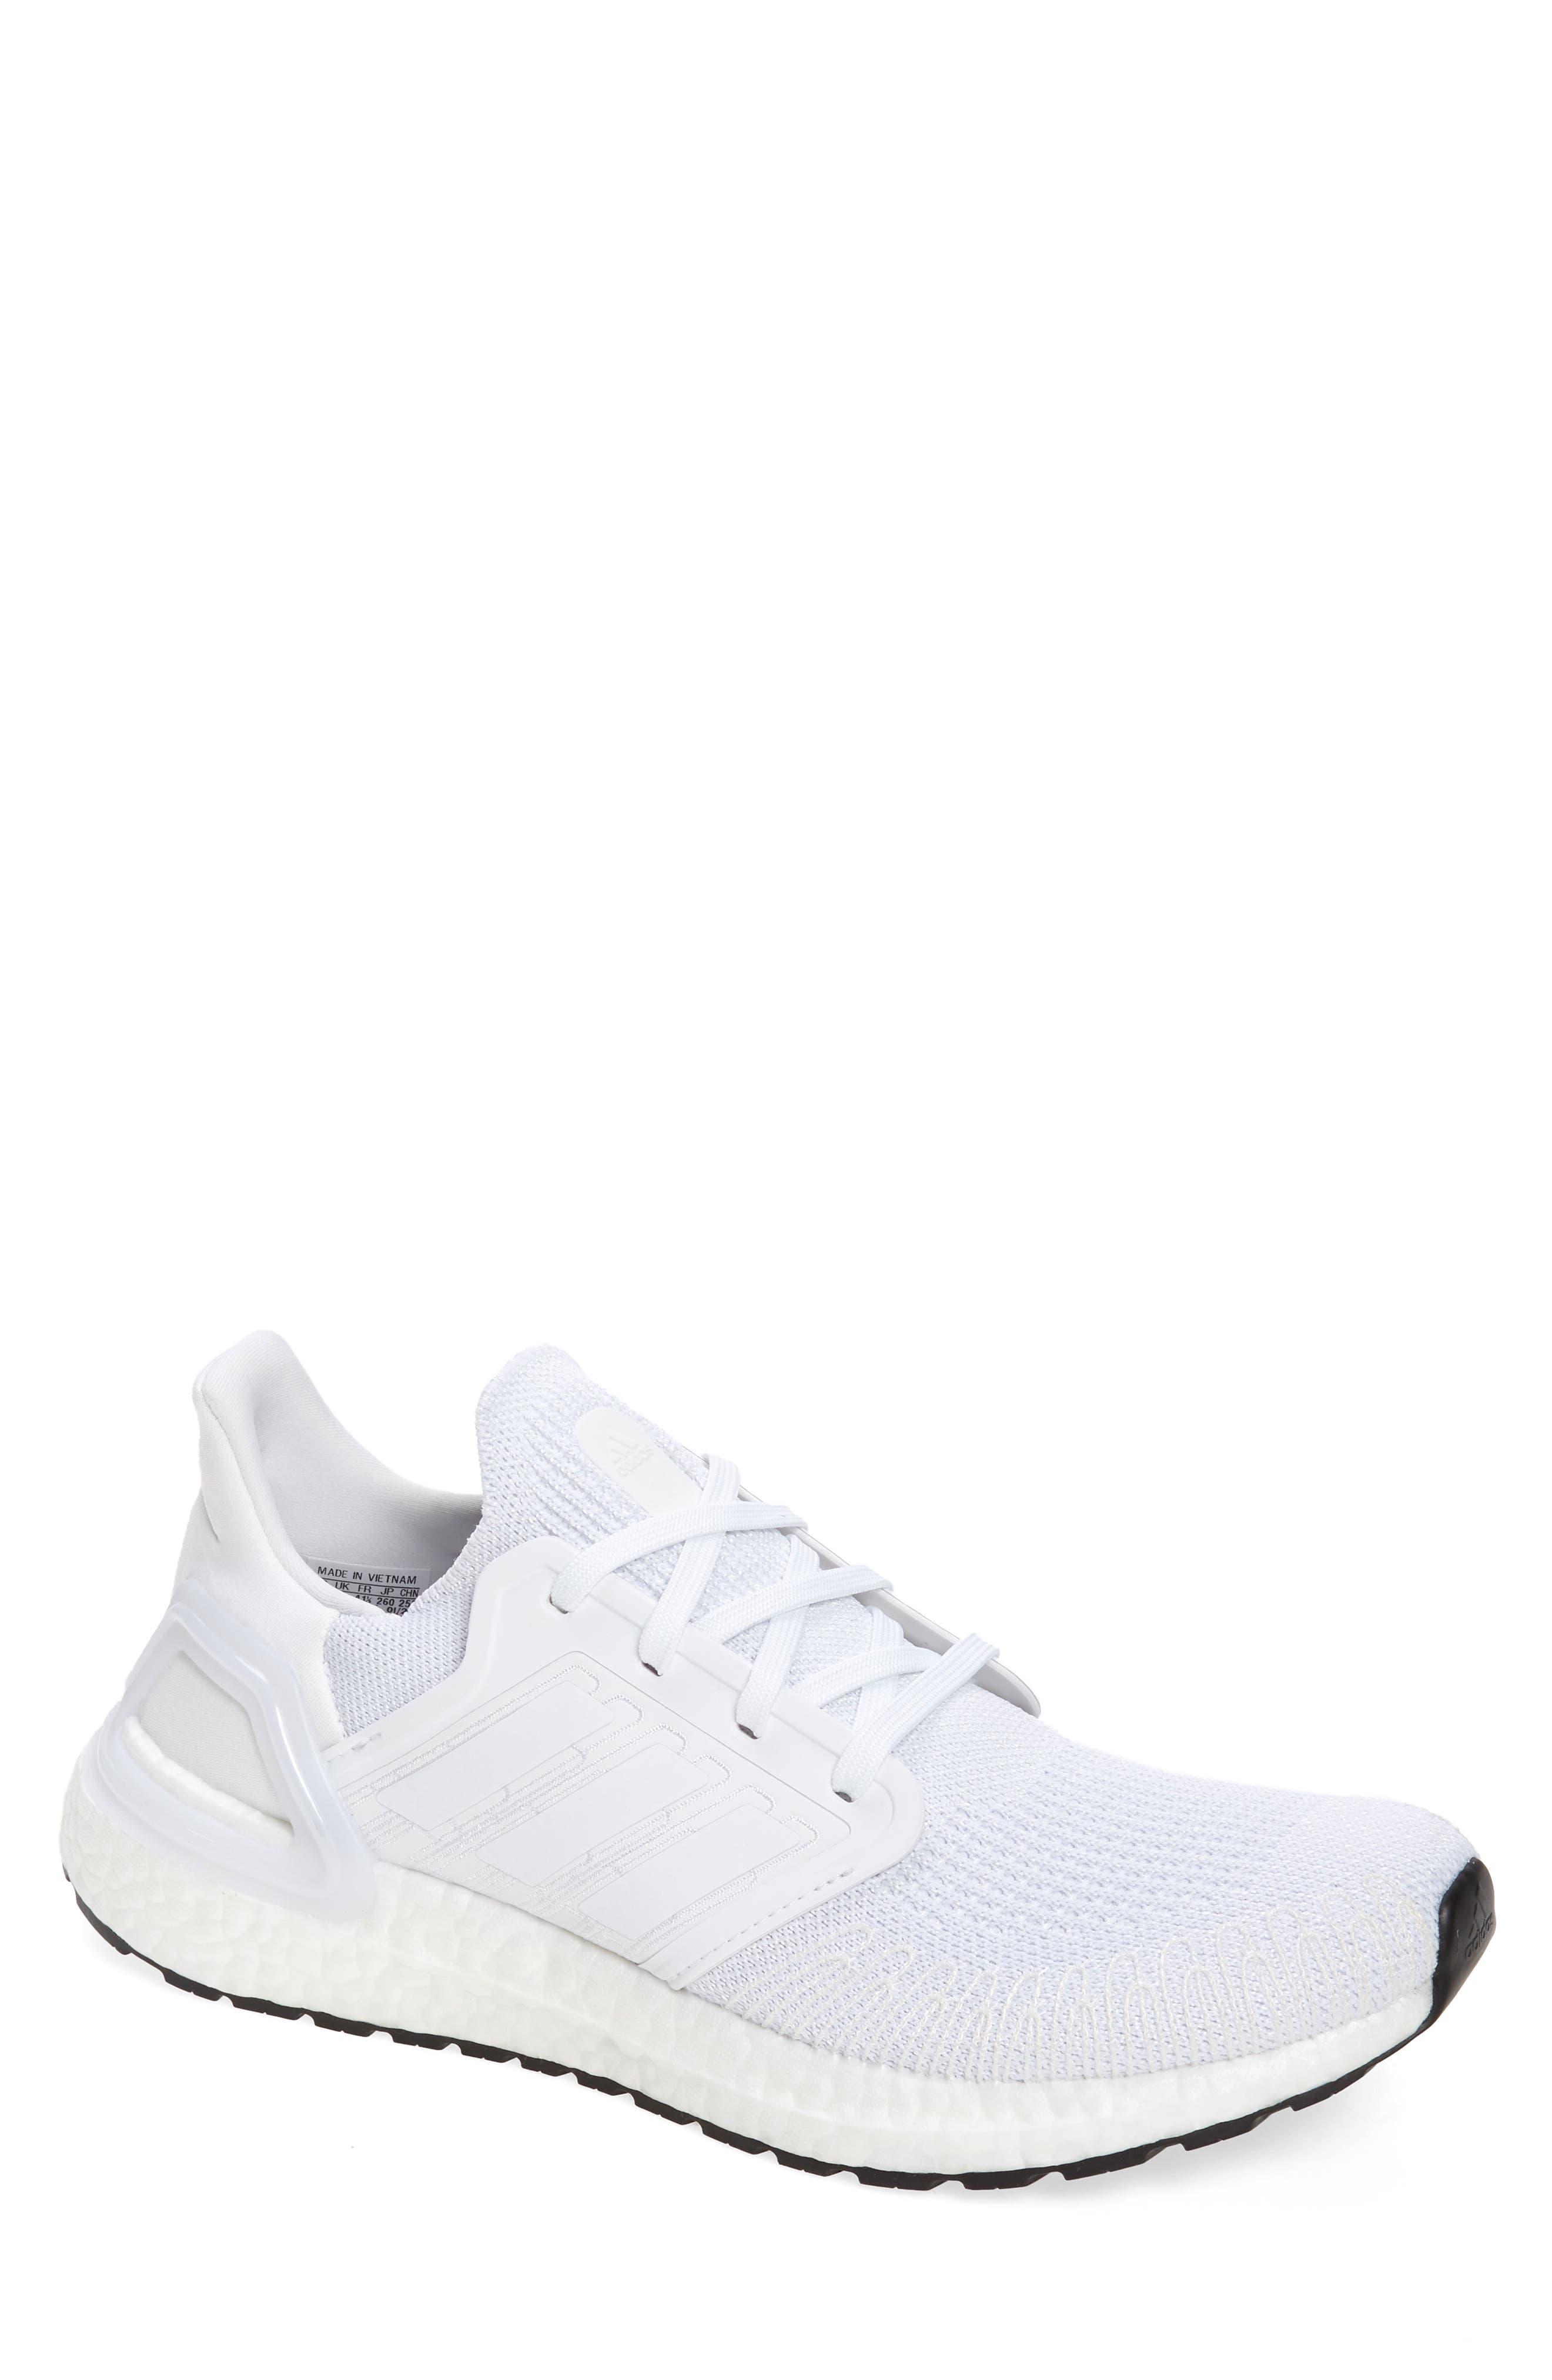 Men's Shoes   Nordstrom